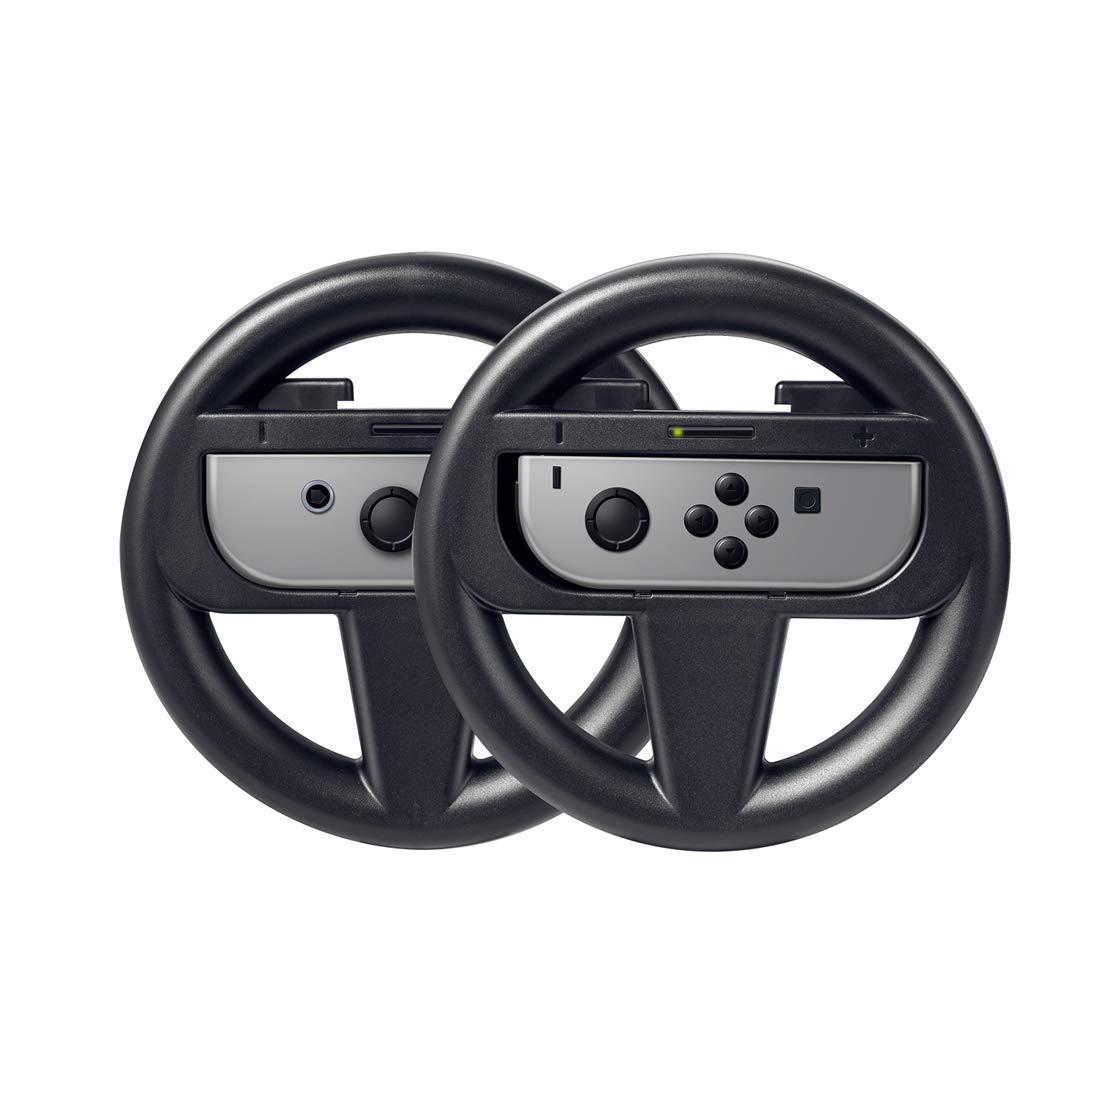 Zecti Joy Con Steering Wheel For Nintendo Switch Console